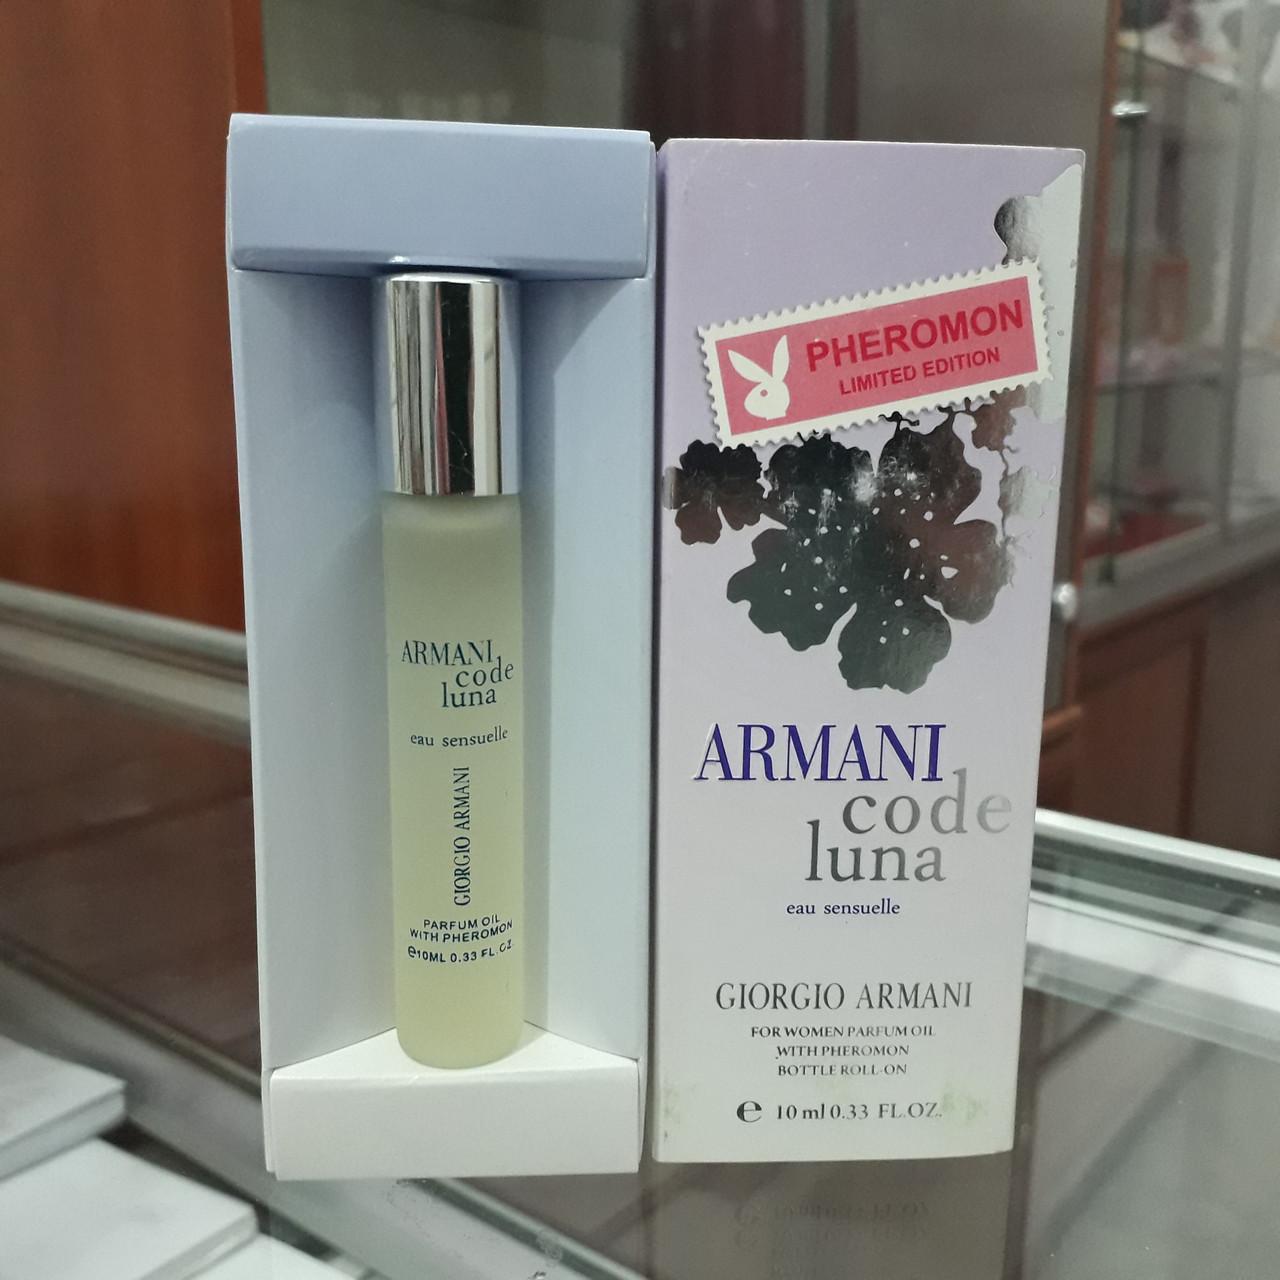 Духи с феромонами   Giorgio Armani Armani Code Luna Eau Sensuelle. 10 ml.